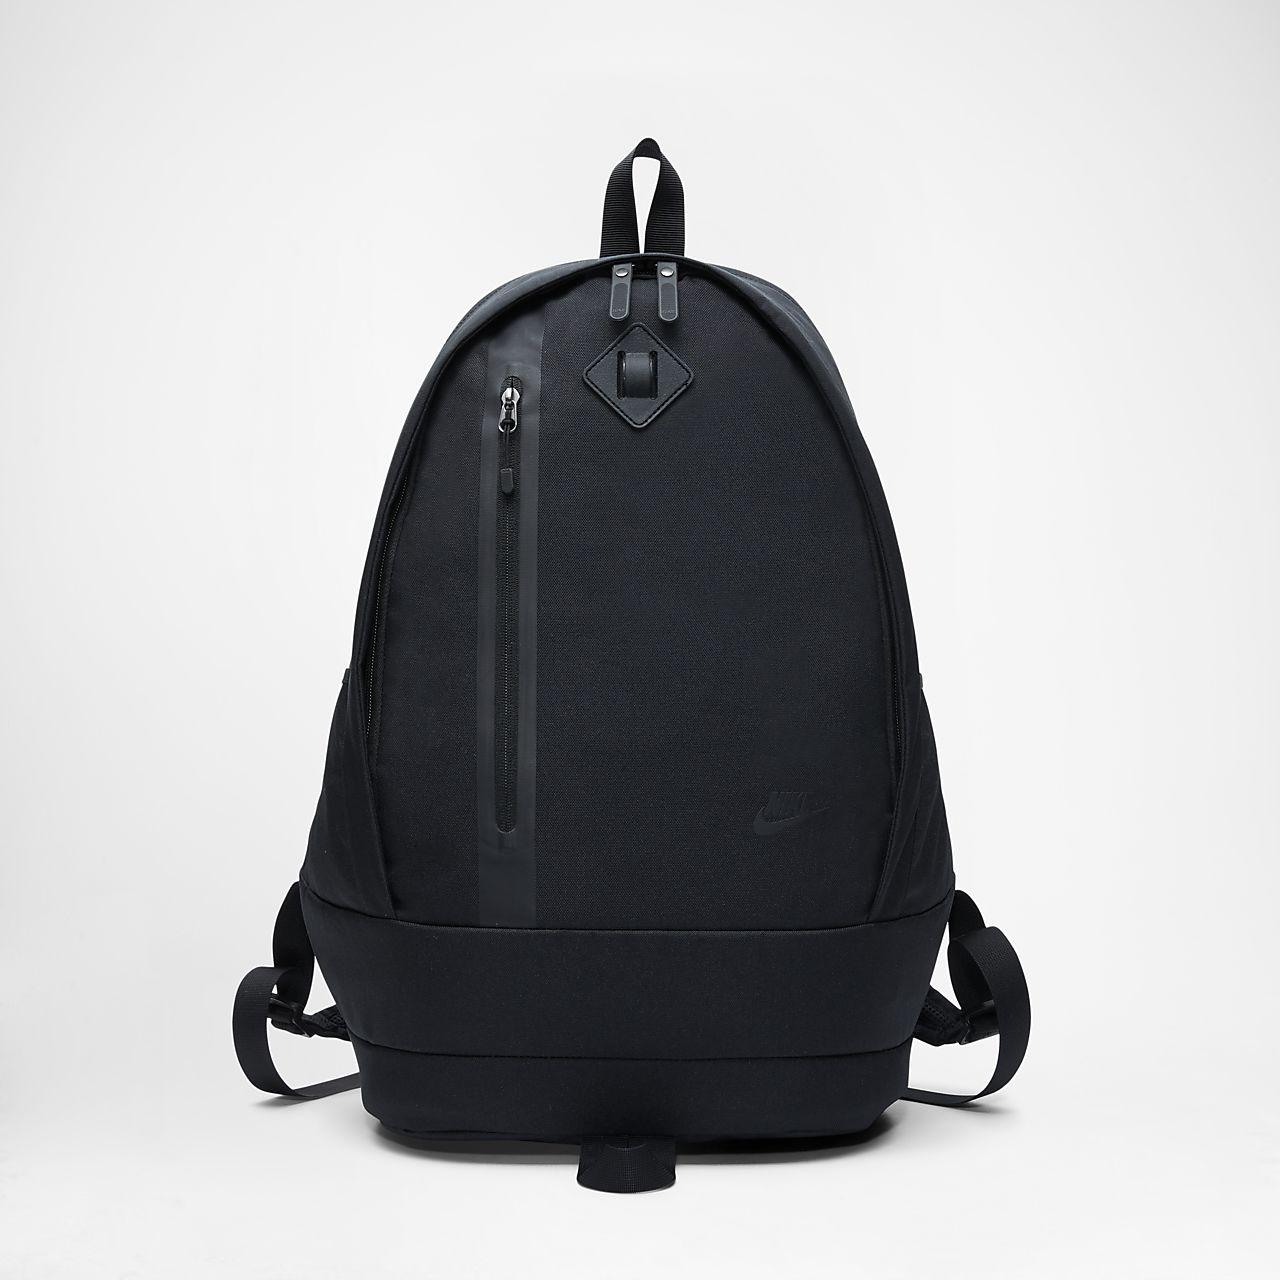 Batoh Nike Sportswear Cheyenne 3.0 Solid